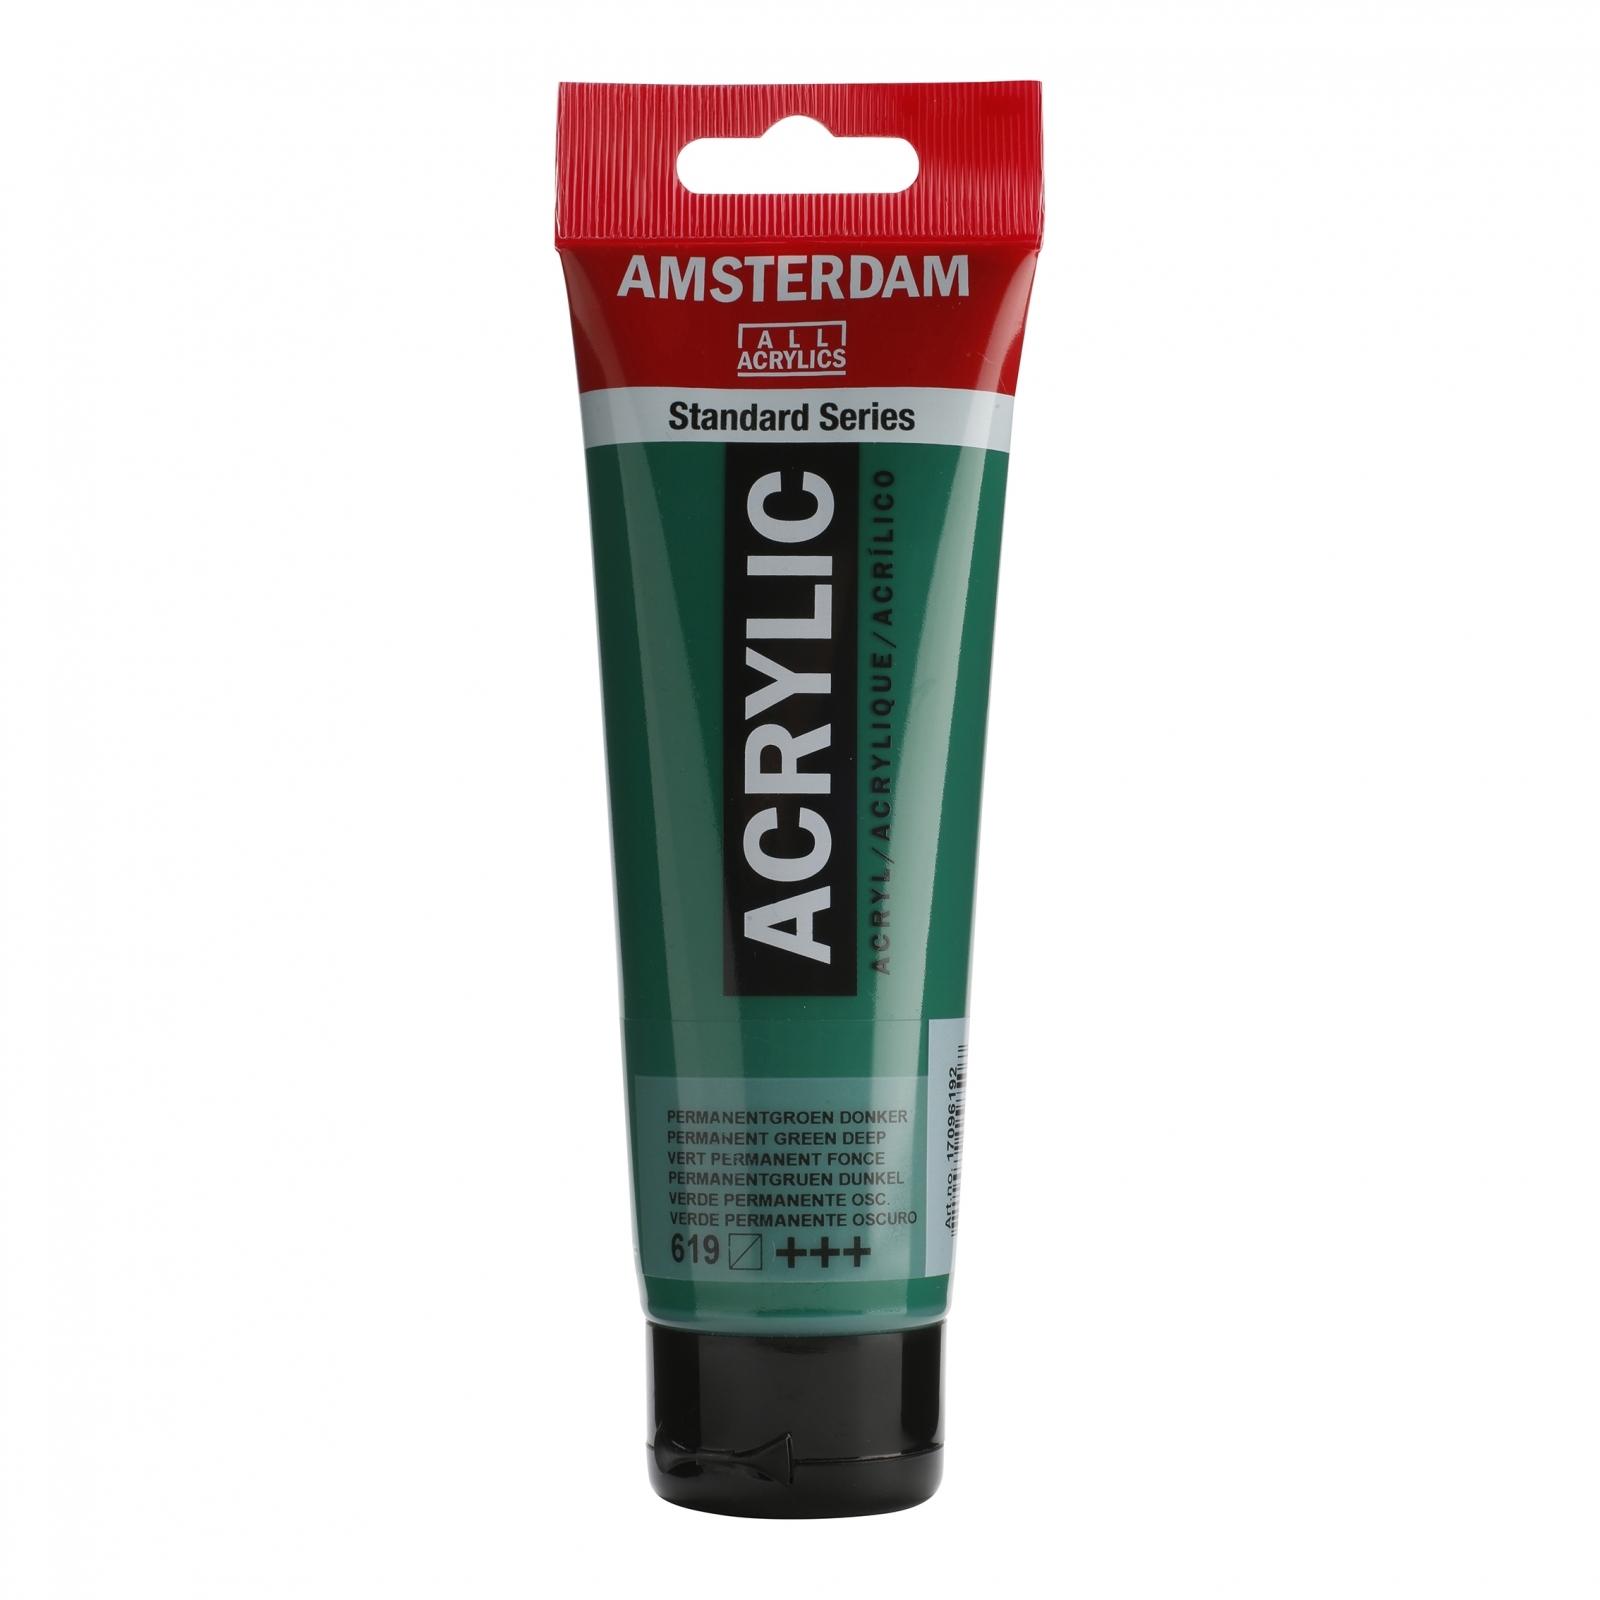 Tinta Acrílica Amsterdam Verde Perm.Claro120ml (+++618) - Papelaria Botafogo